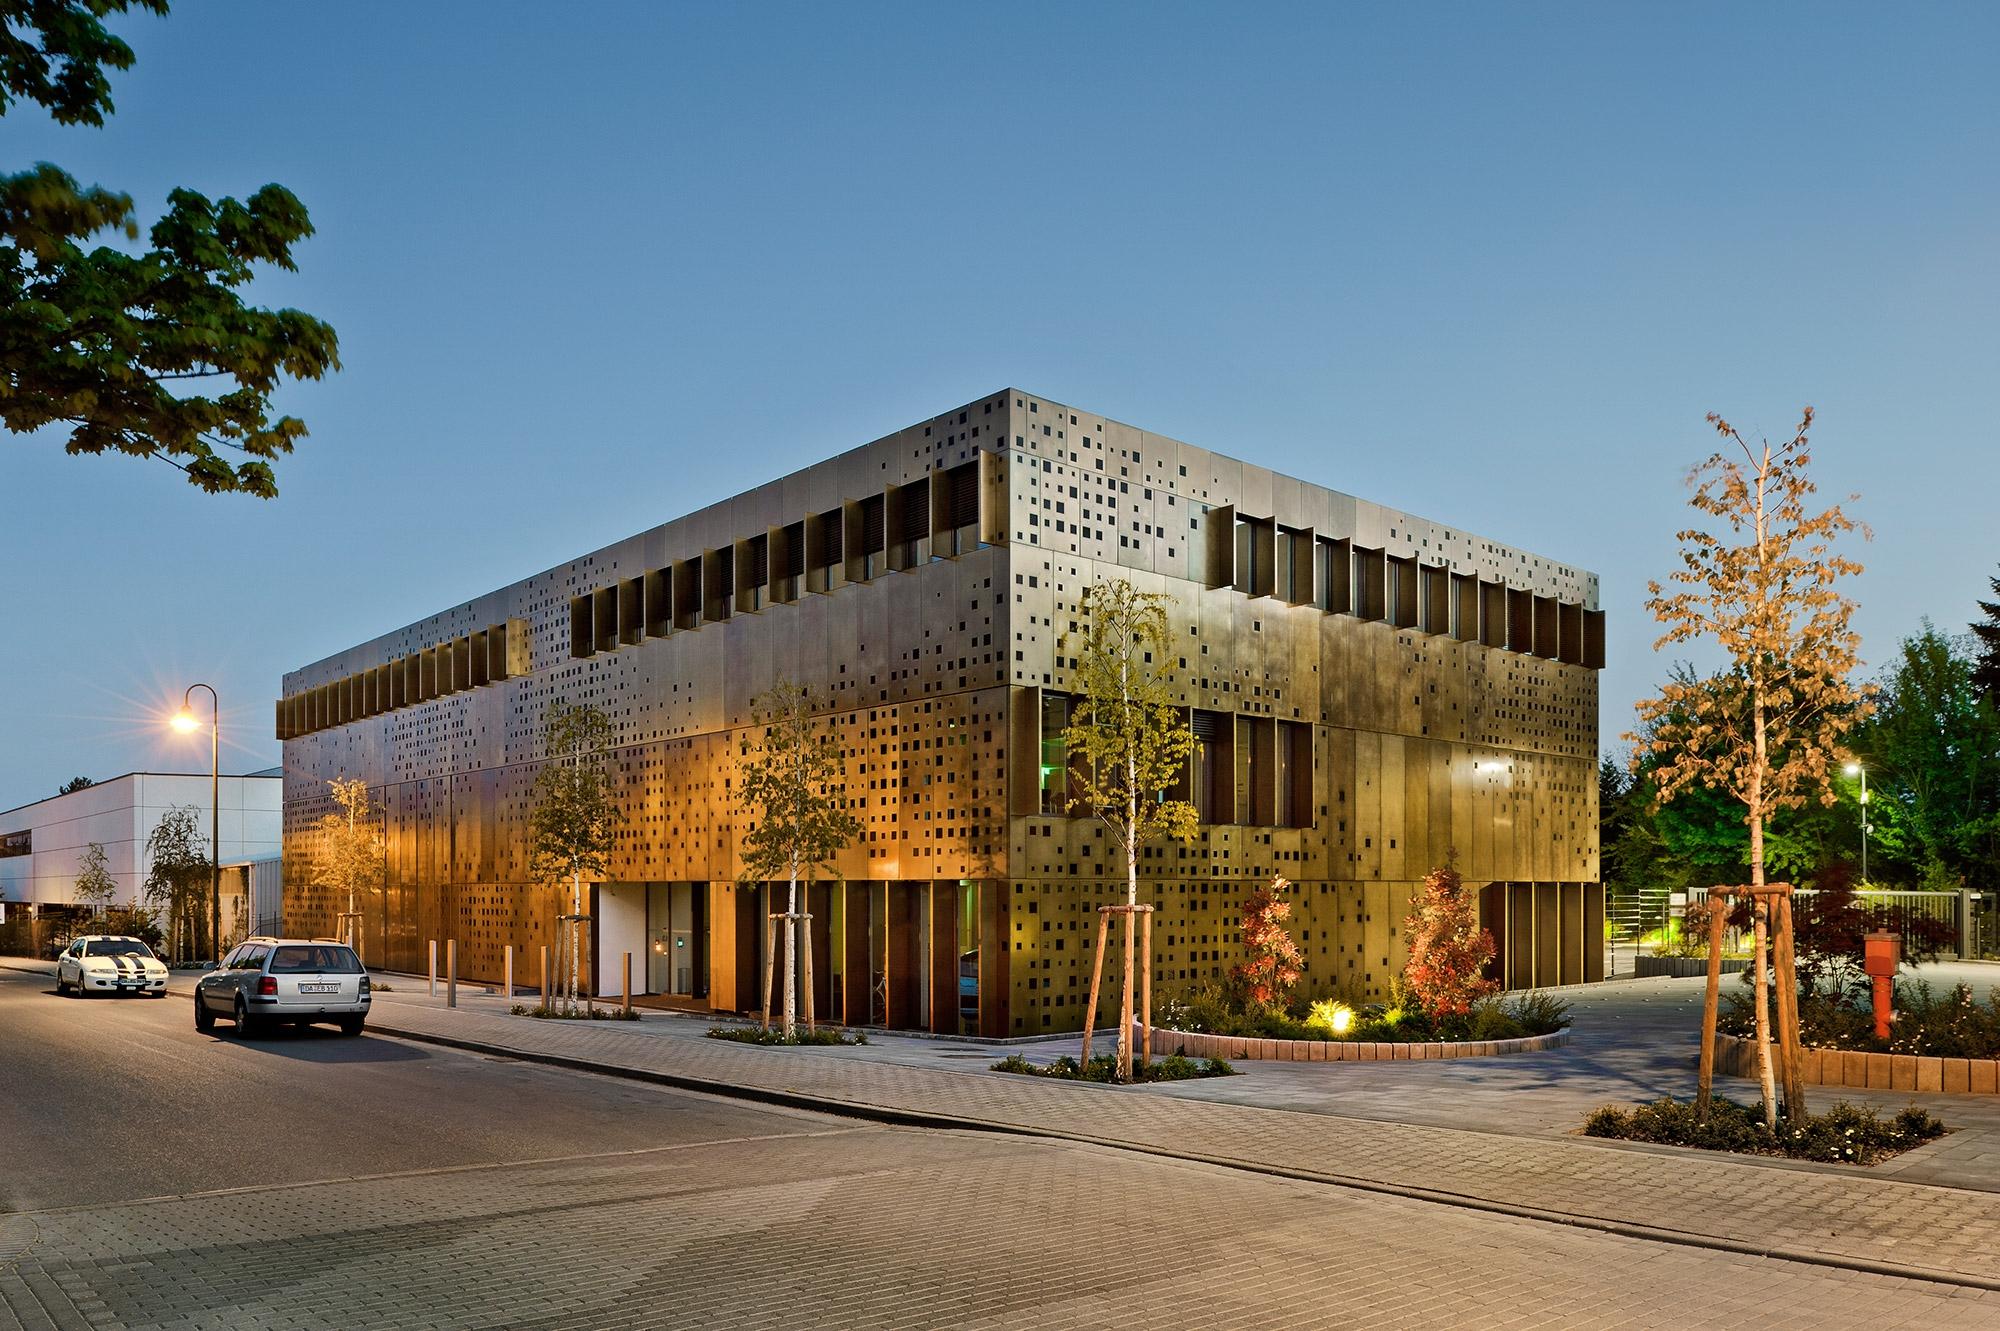 Ergebnis tecu architecture award competitionline